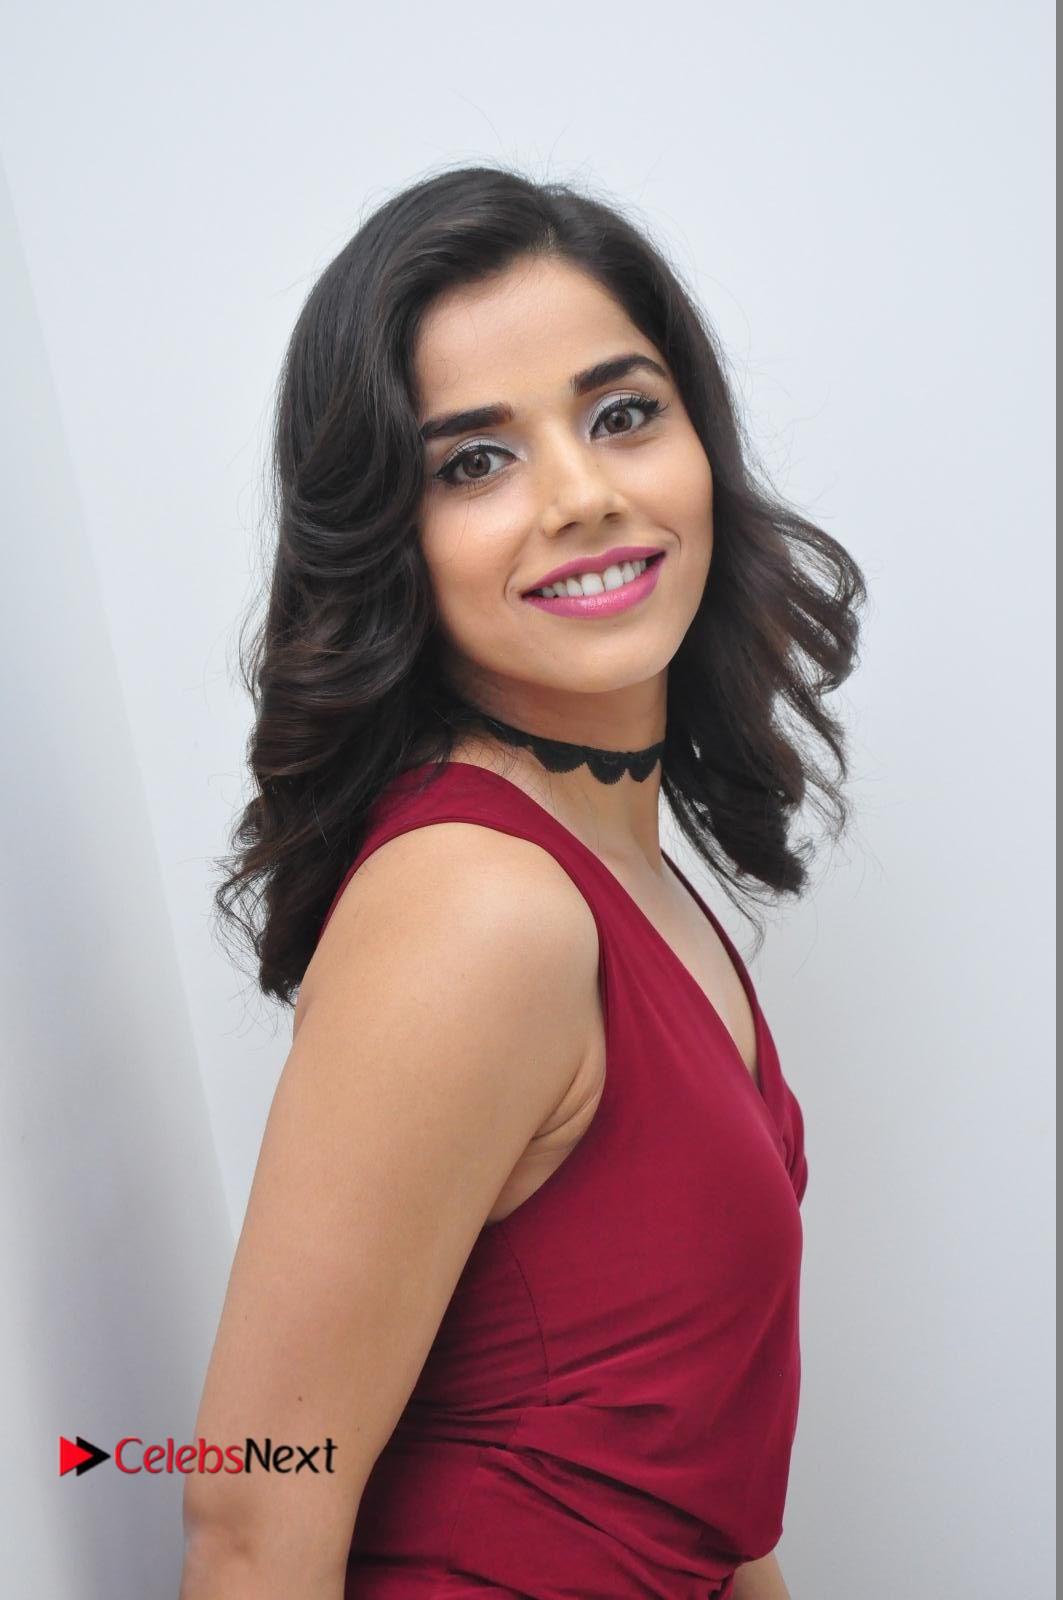 Aparna Bajpai